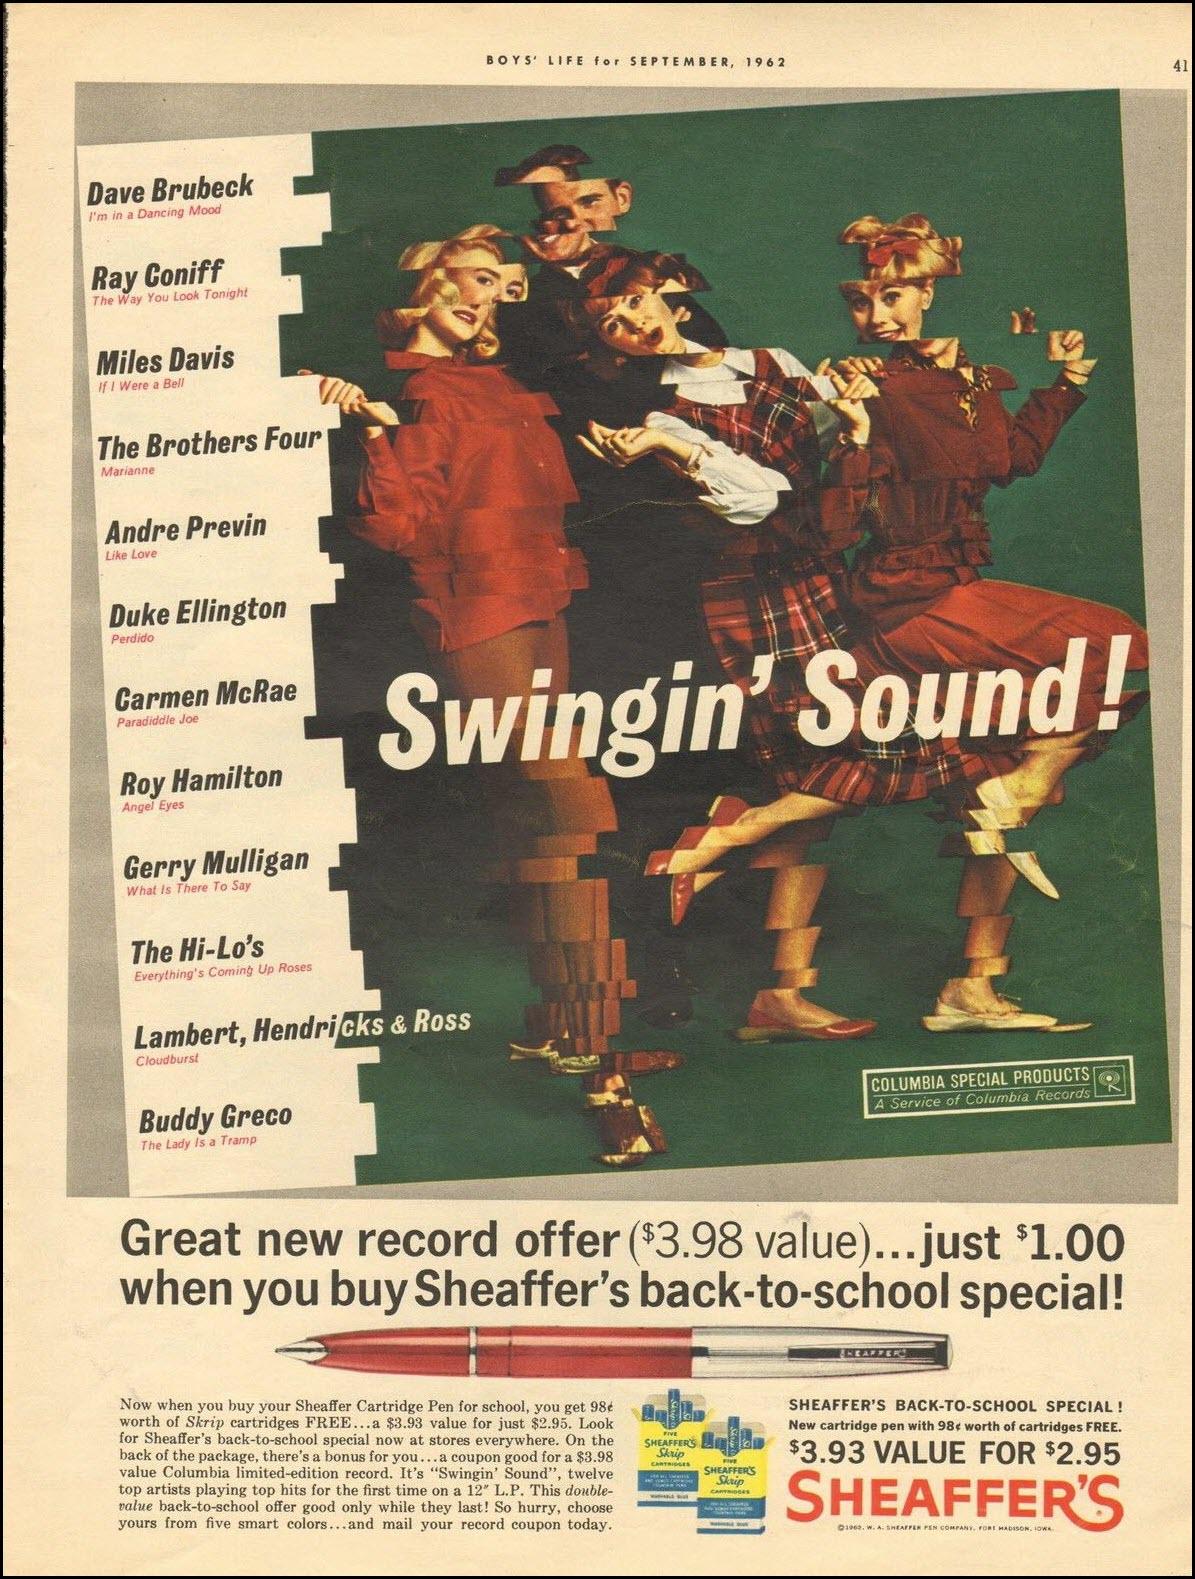 Vintage back-to-school advertisement: Sheaffer's, 1962